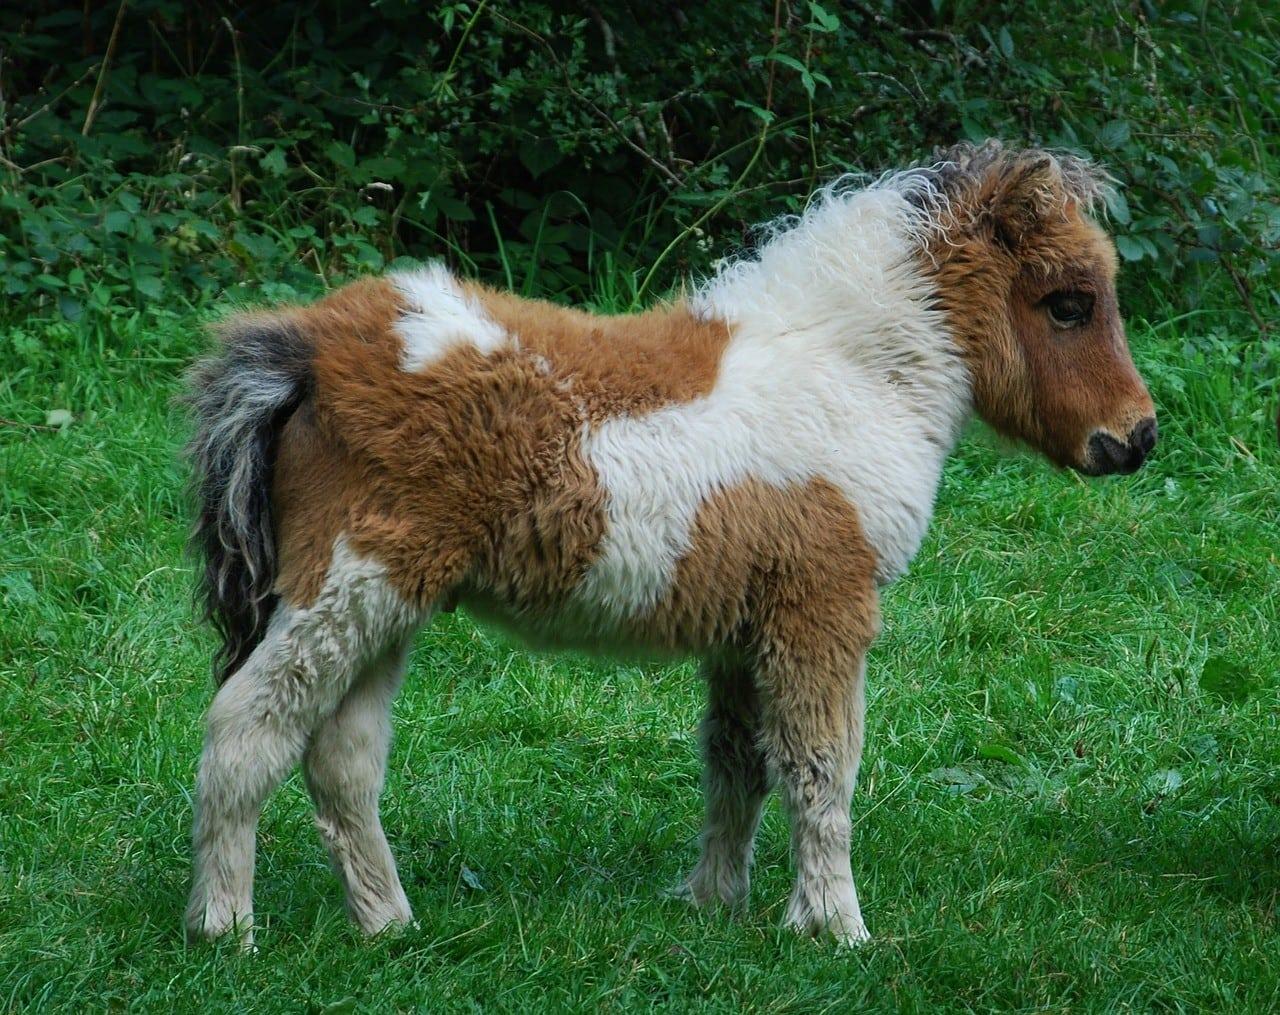 pony in grass